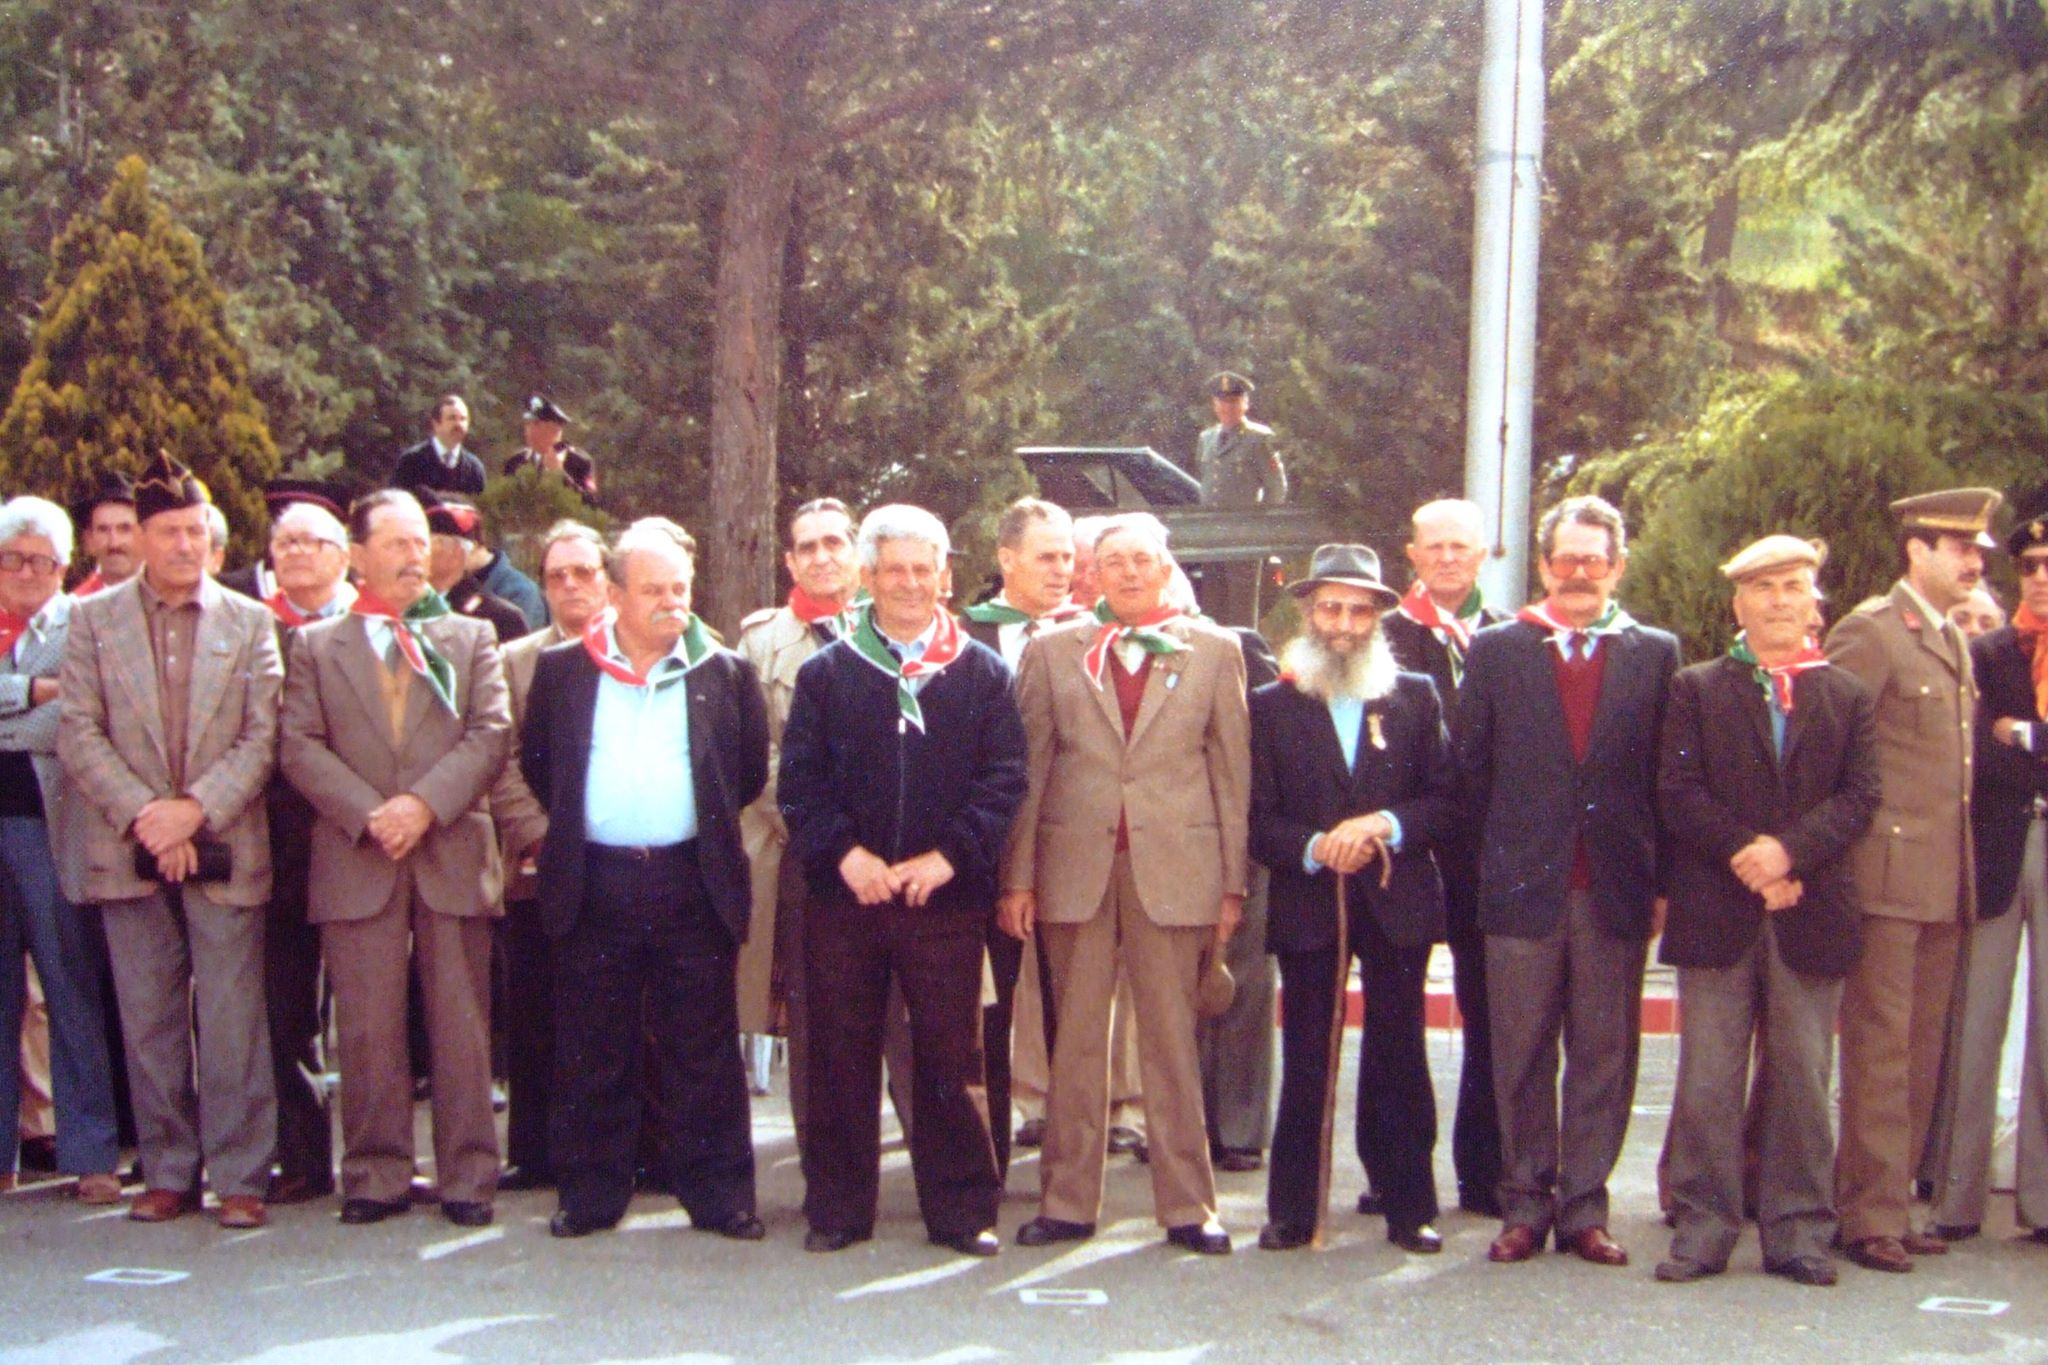 Partigiani presso la caserma in str. Cimina.